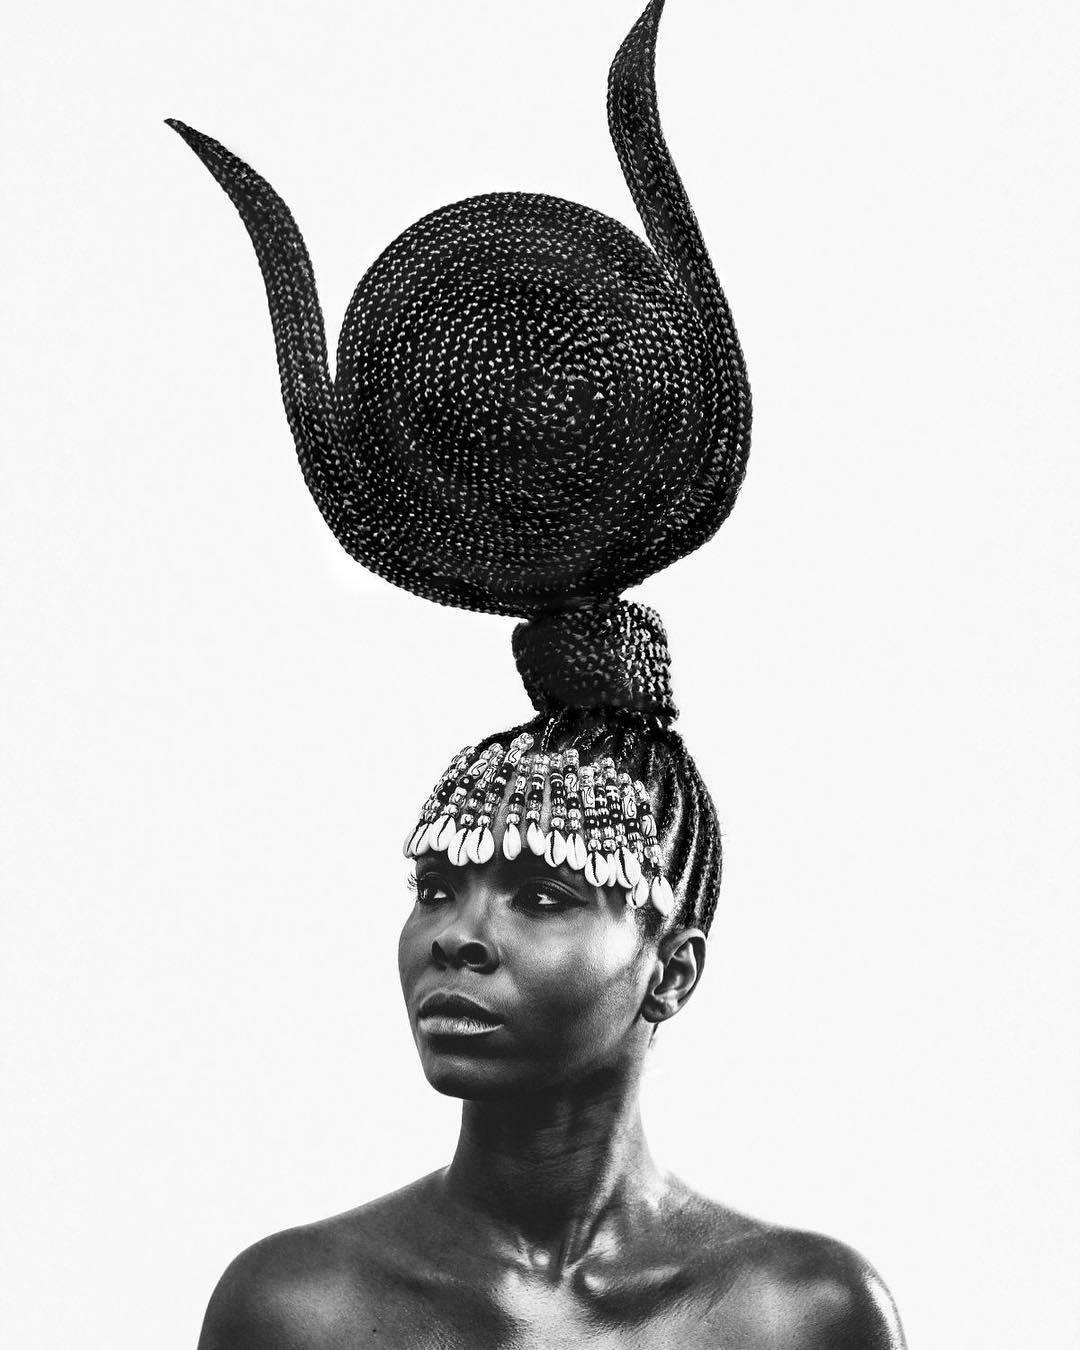 Pure art! @Crowezilla ✨✨✨ #inspiration https://t.co/Ubzp2wfI2k